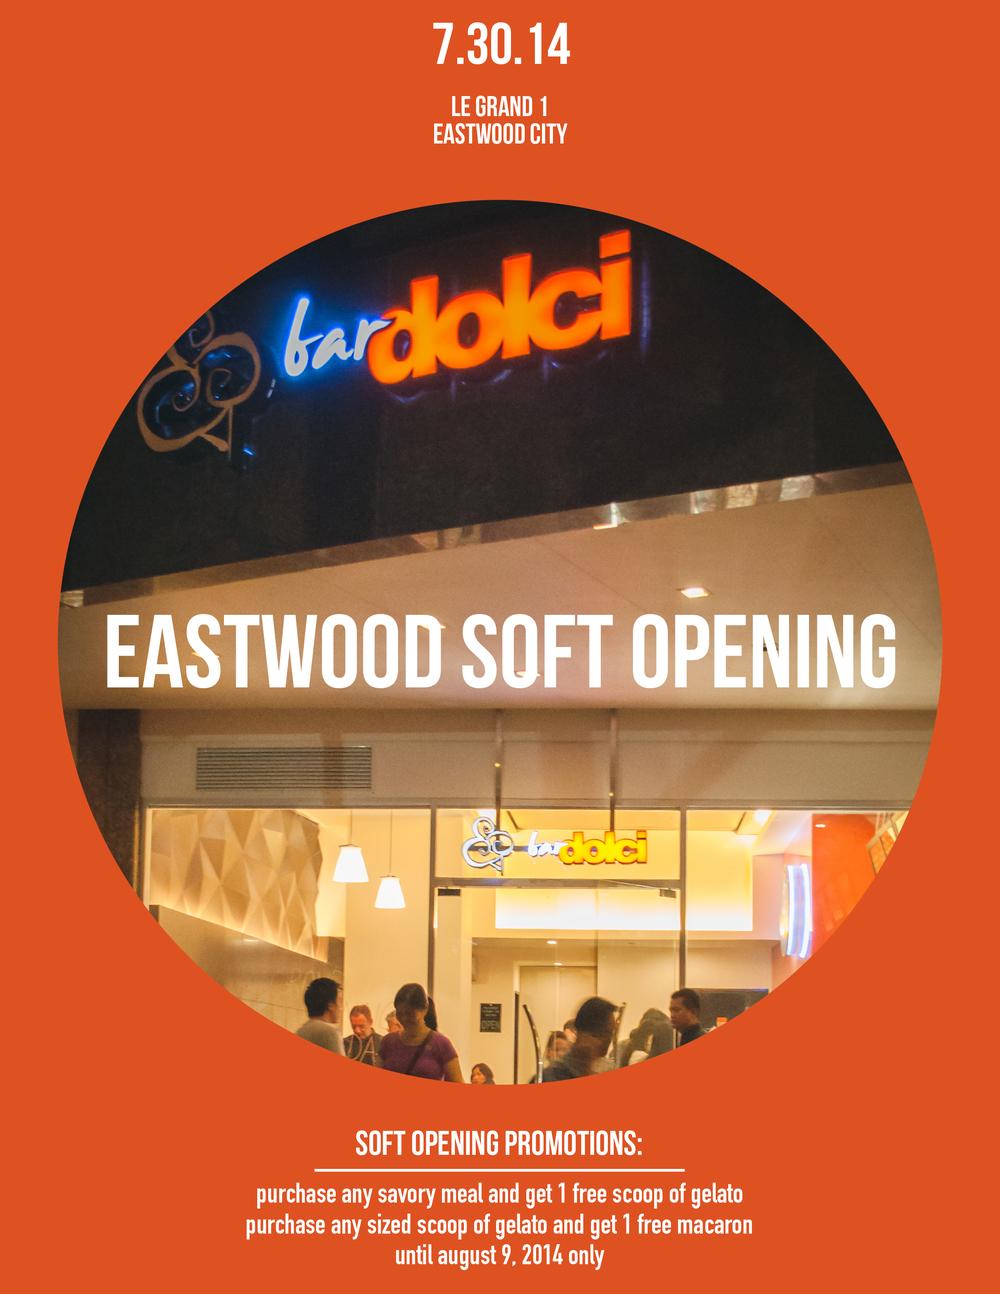 Eastwood Soft Opening.jpg